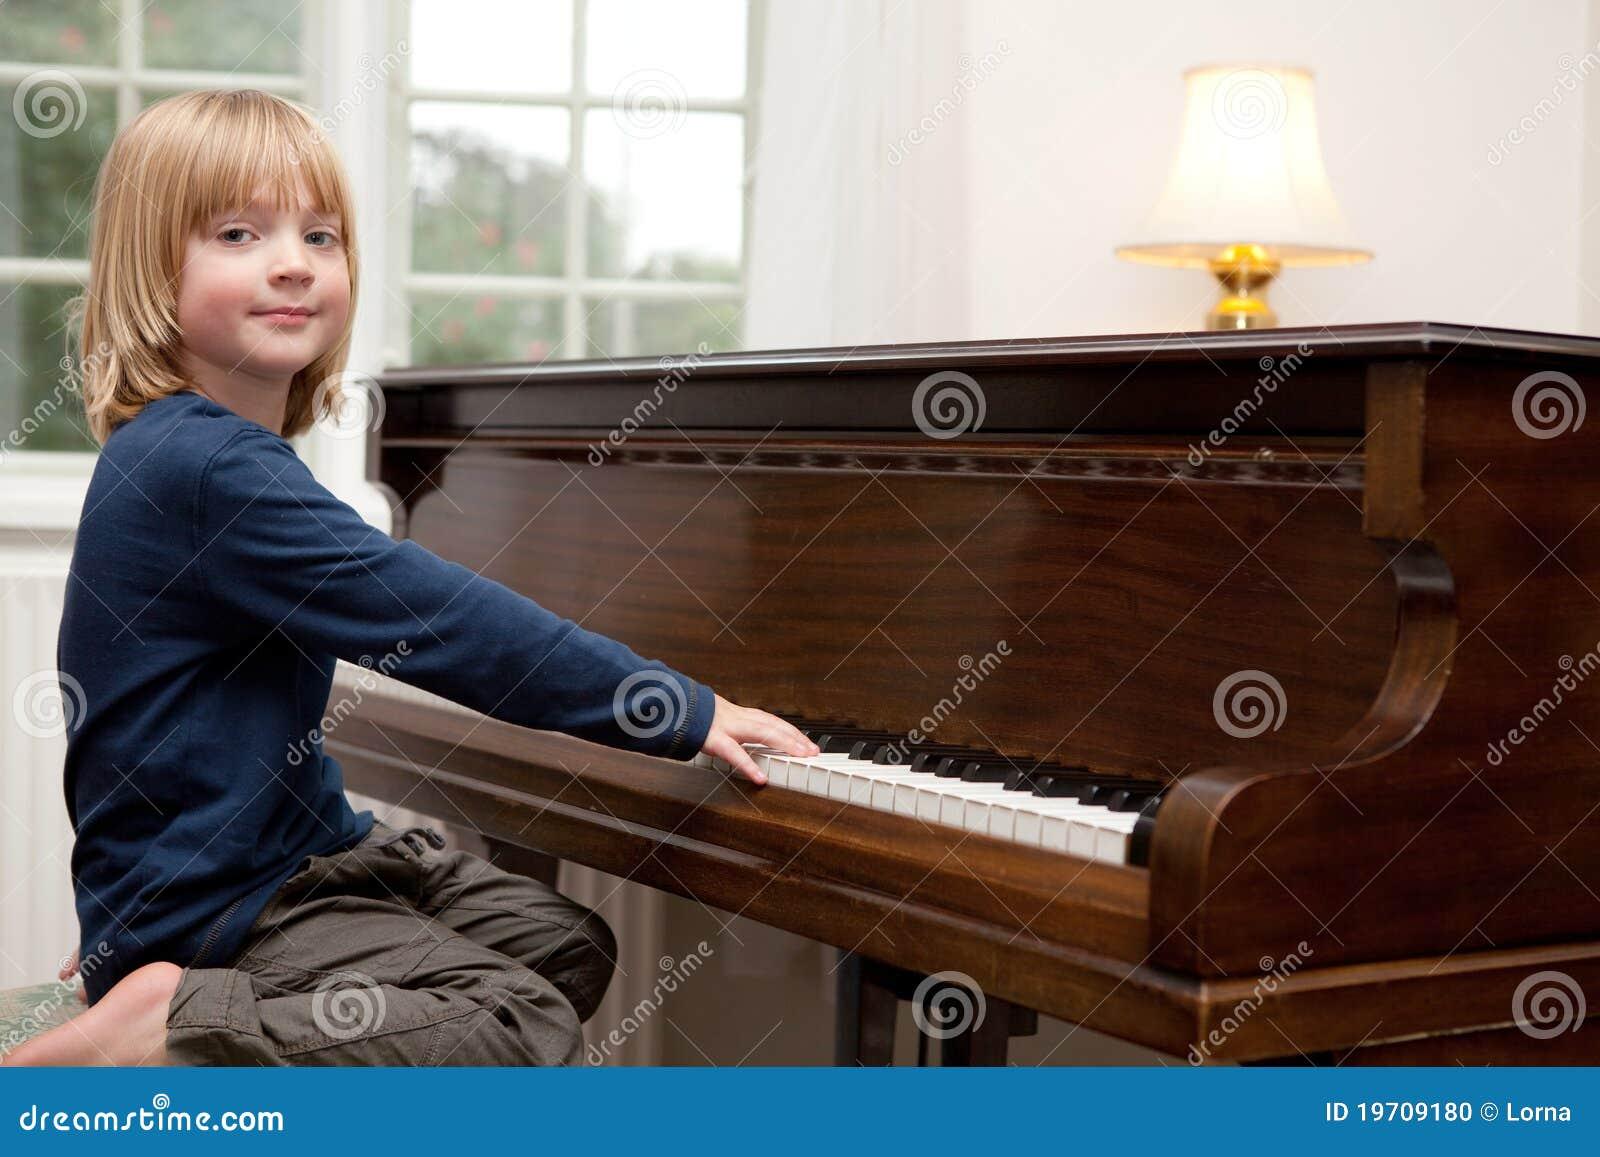 Playing piano music, boy Child instrument